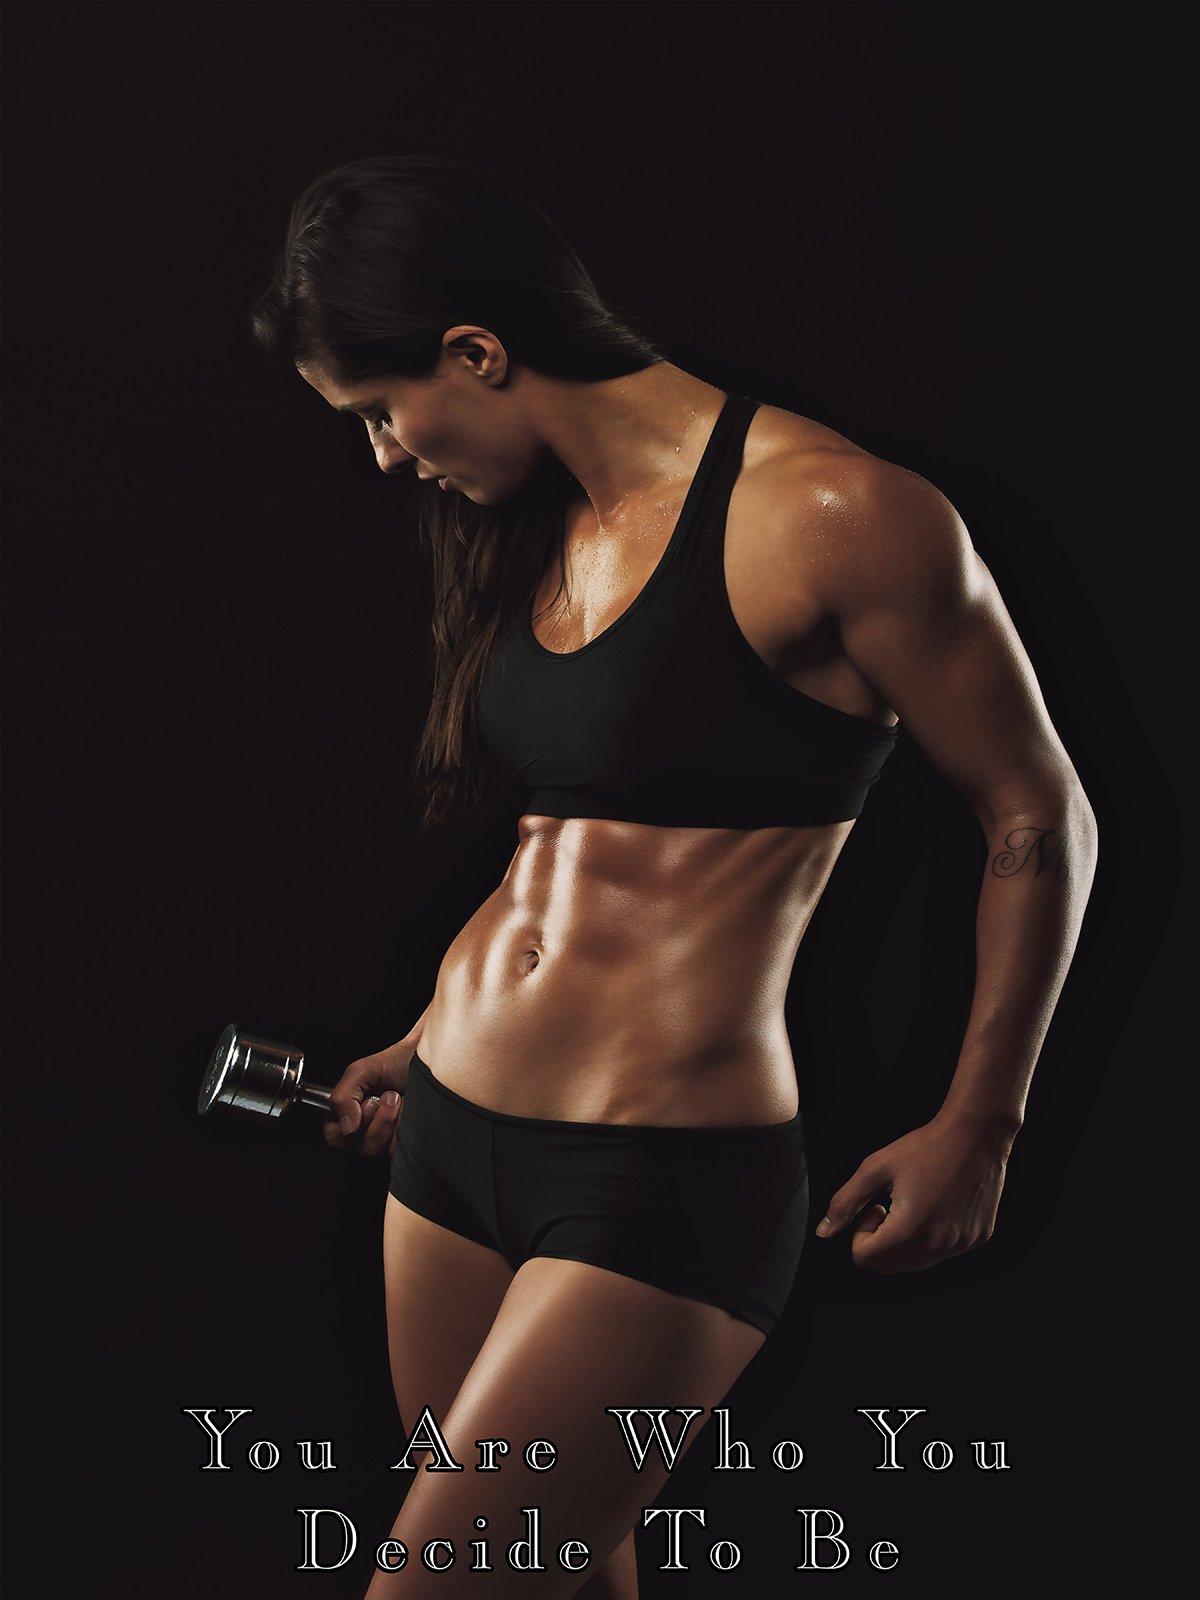 Fitness Model Poster Female Bodybuilder Workout Motivation Gym Poster 24x36 (SGV27)